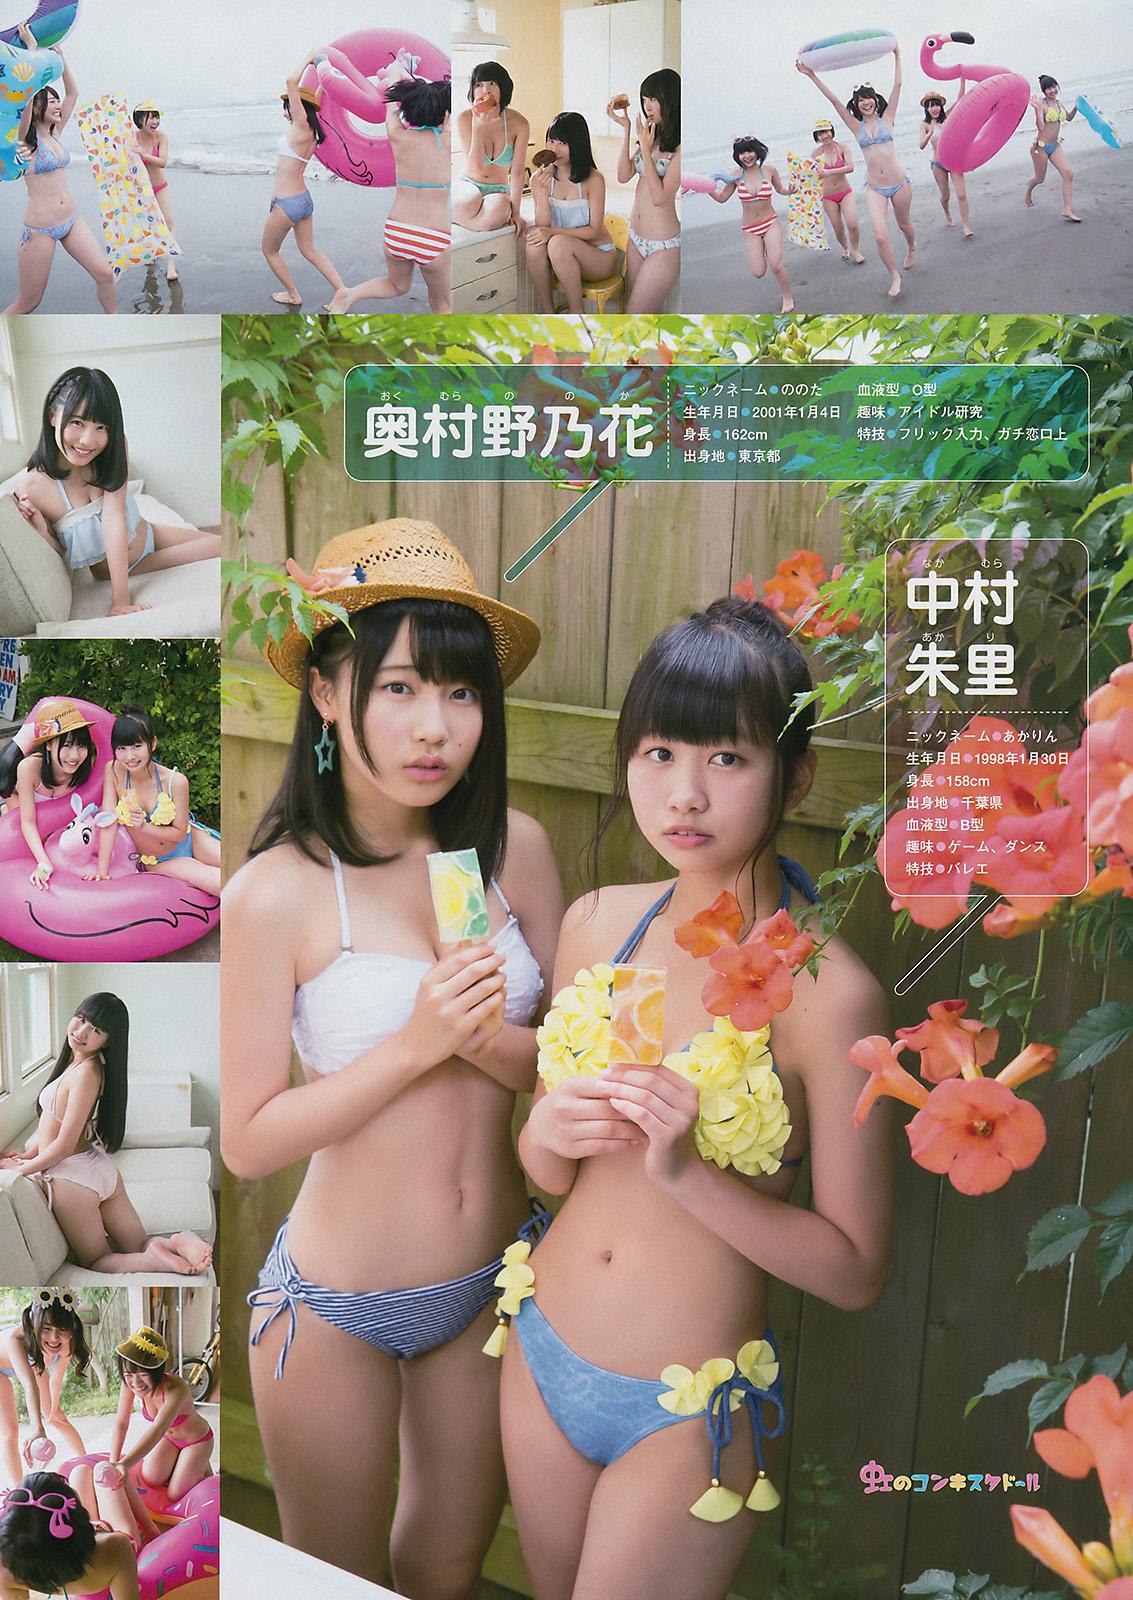 Niji No Conquistador, Young Magazine 2017 No.38 (週刊ヤングマガジン 2017年38号)